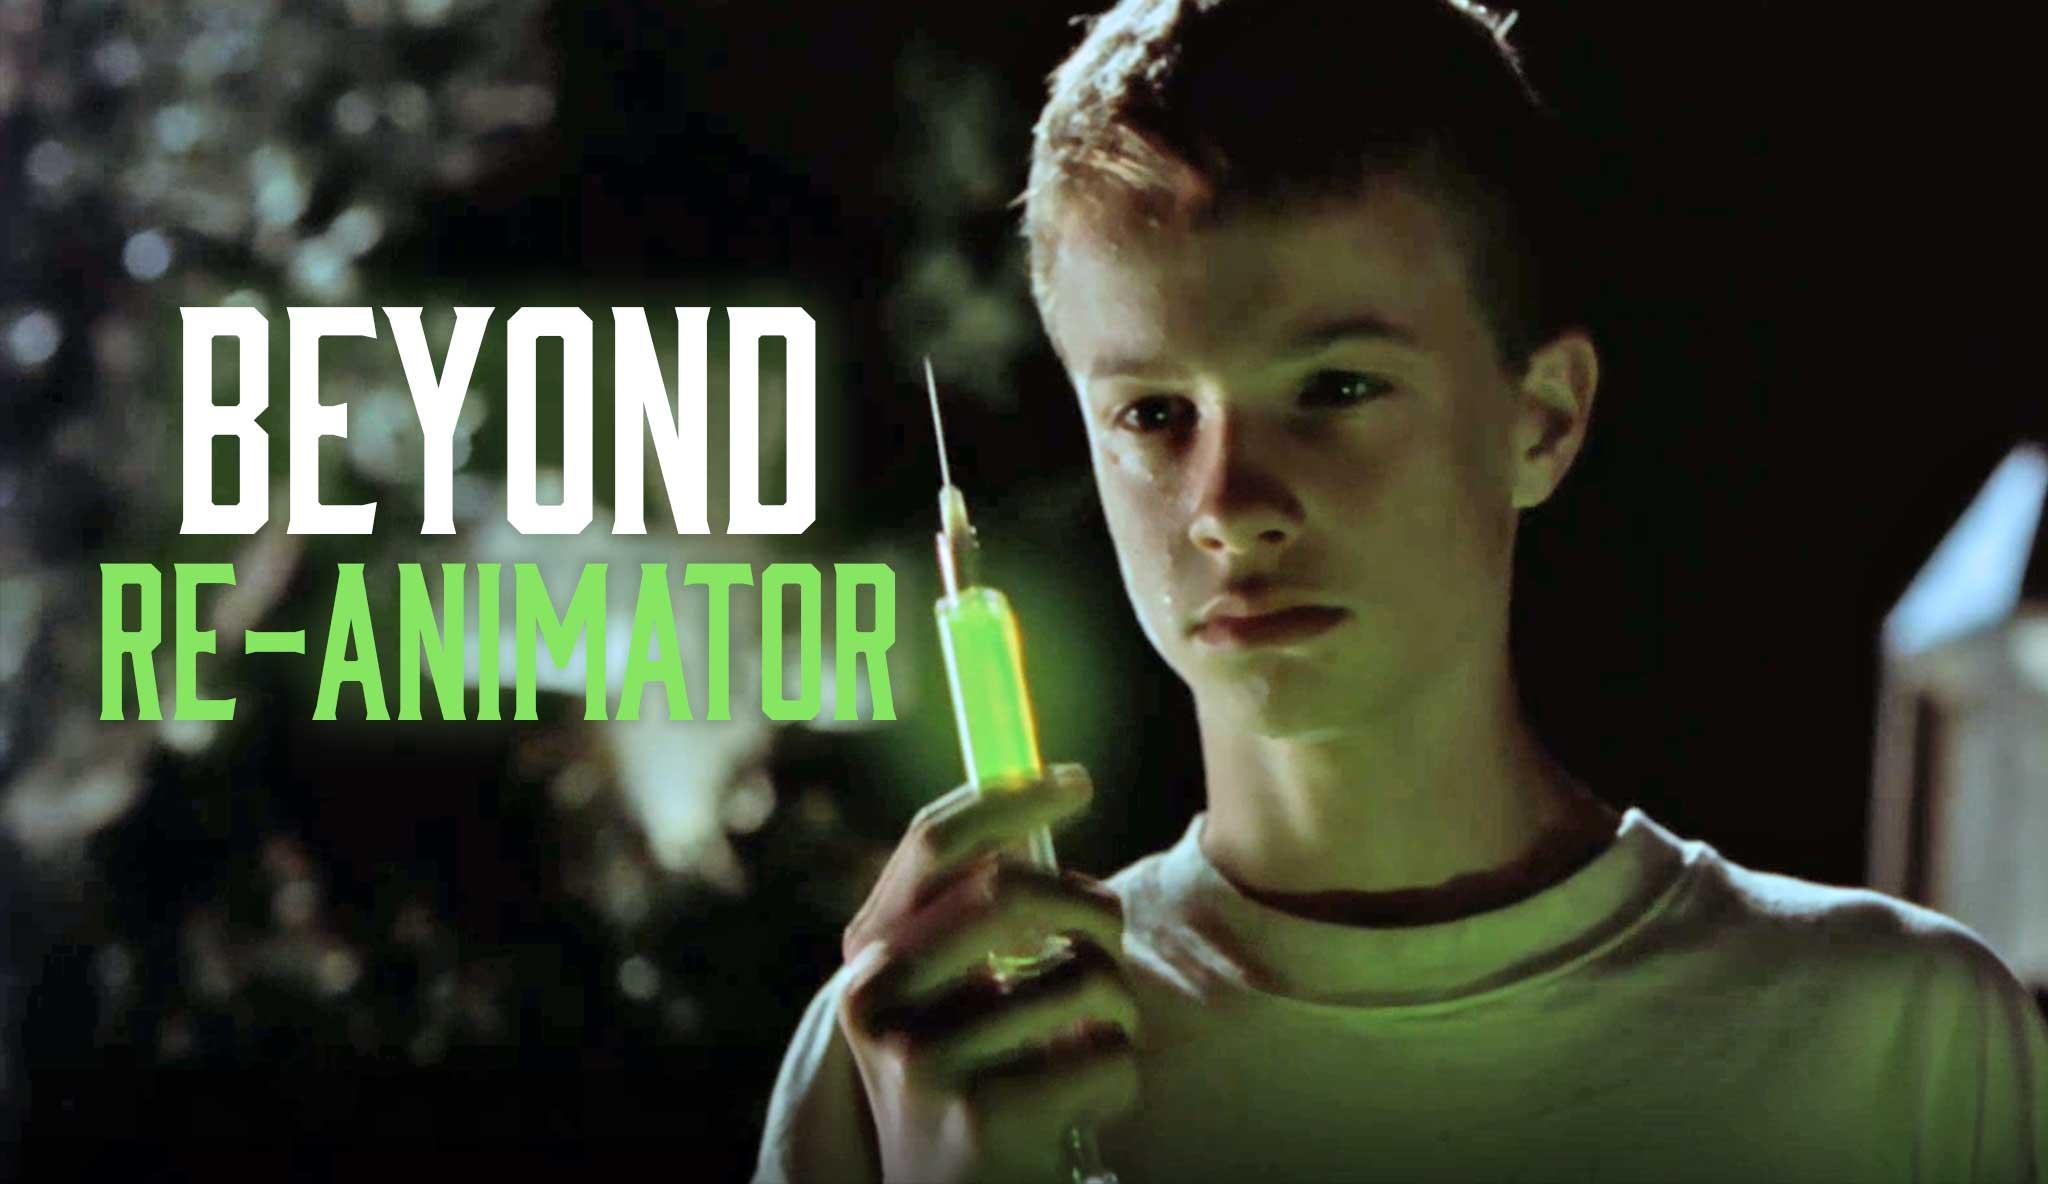 beyond-re-animator\header.jpg